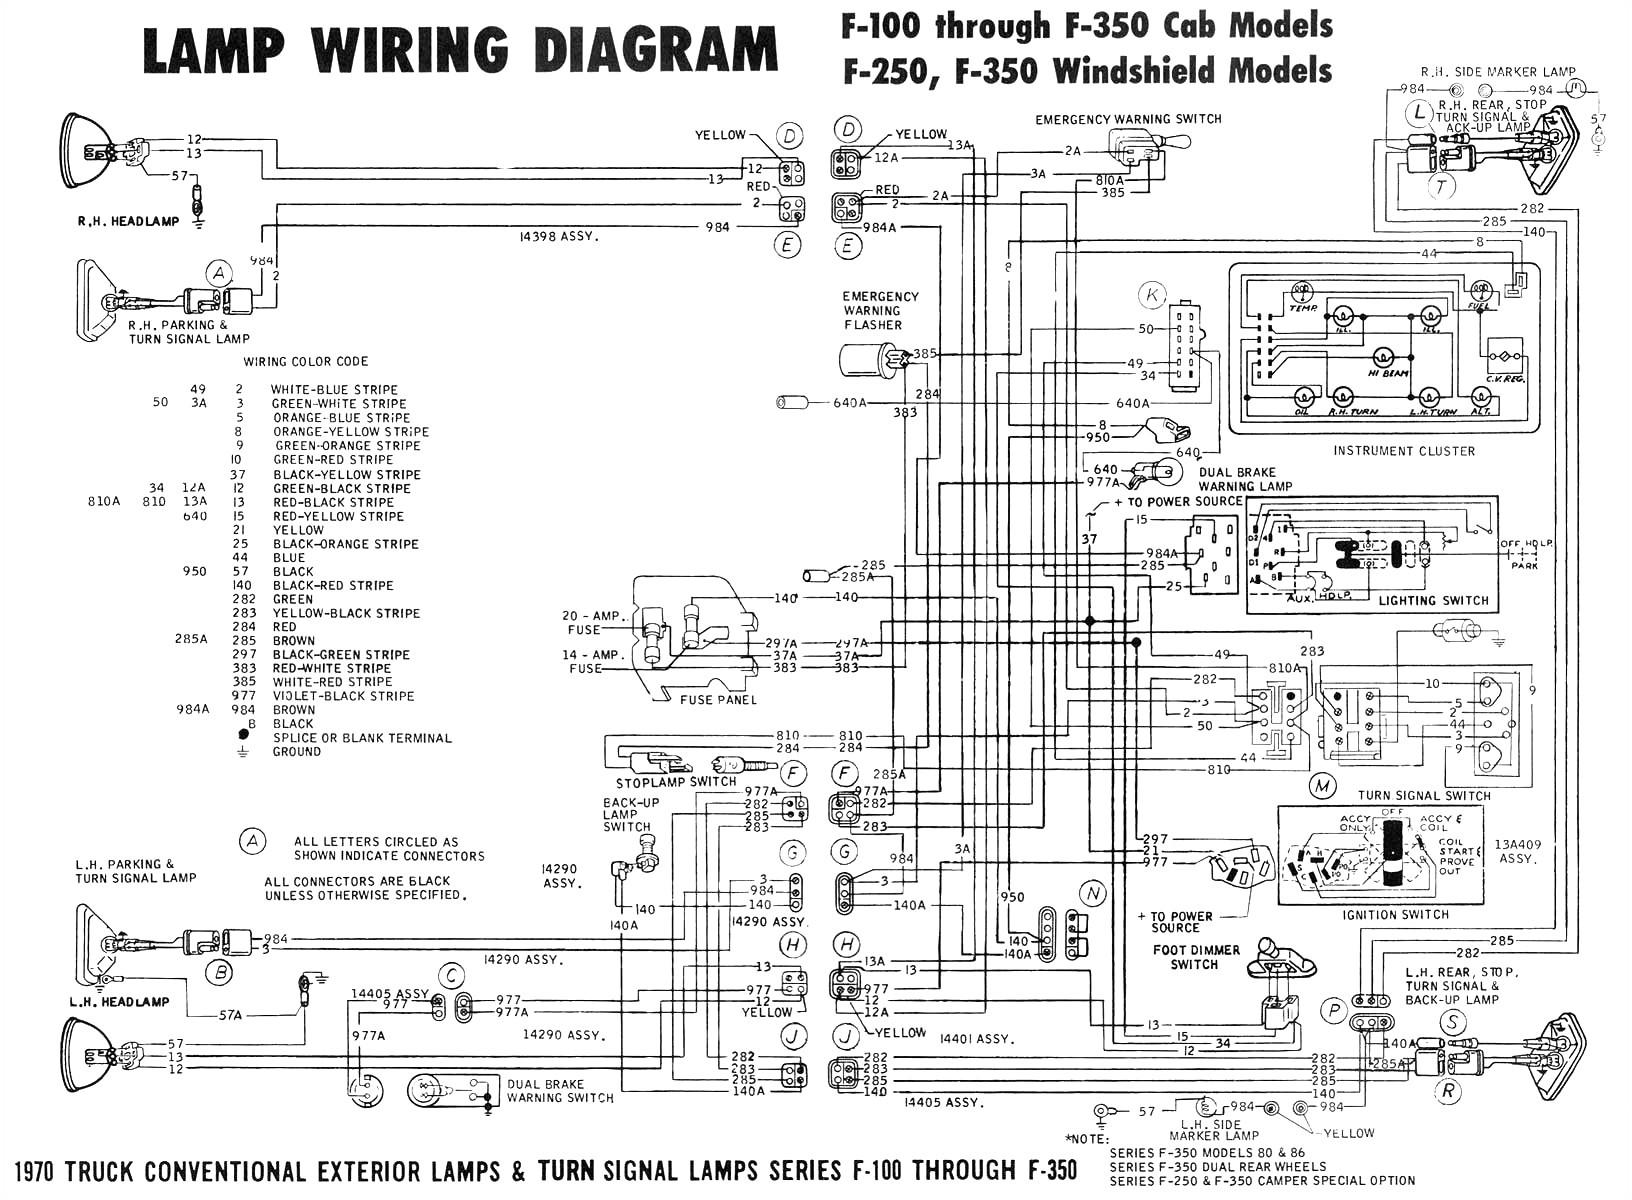 2003 f350 headlight switch wiring diagram wiring diagram view dimmer switch wiring diagram 2003 ford super duty